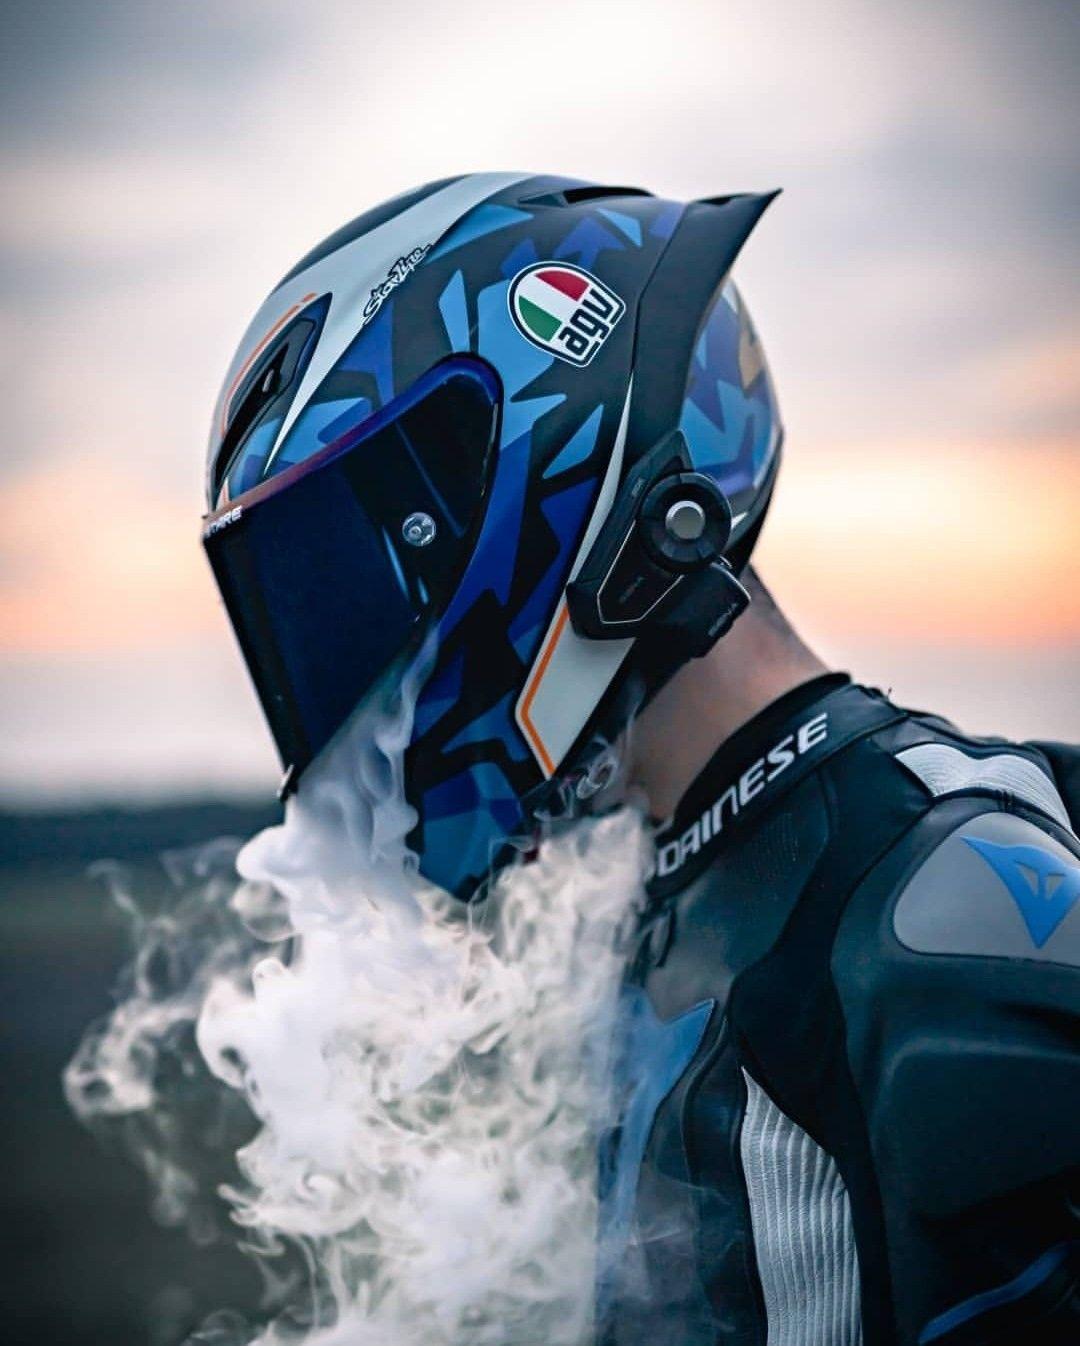 Pin By Modifiedx On Bikers Dirt Bike Helmets Sport Bike Helmets Bike Photoshoot